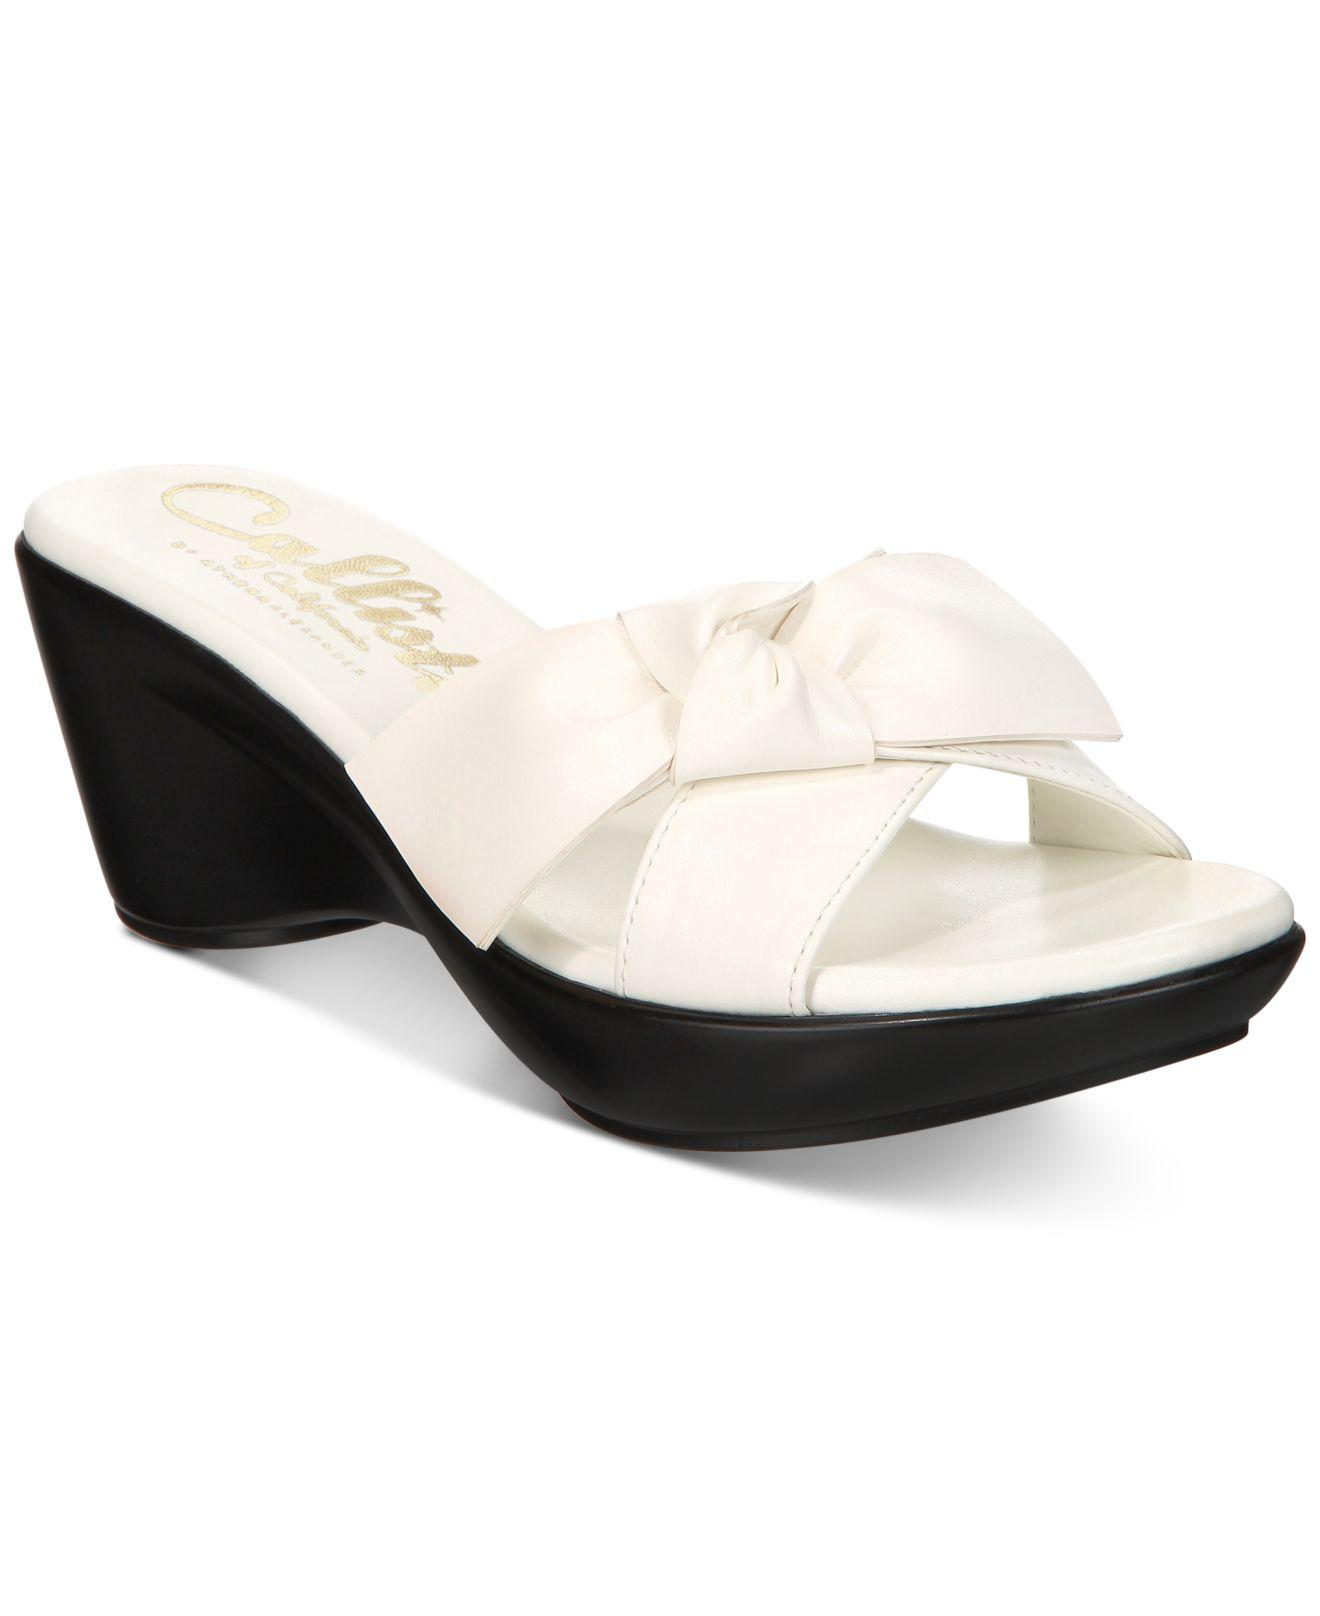 091c59fb7af6 Callisto. Women s White Catriona Wedge Sandals ...